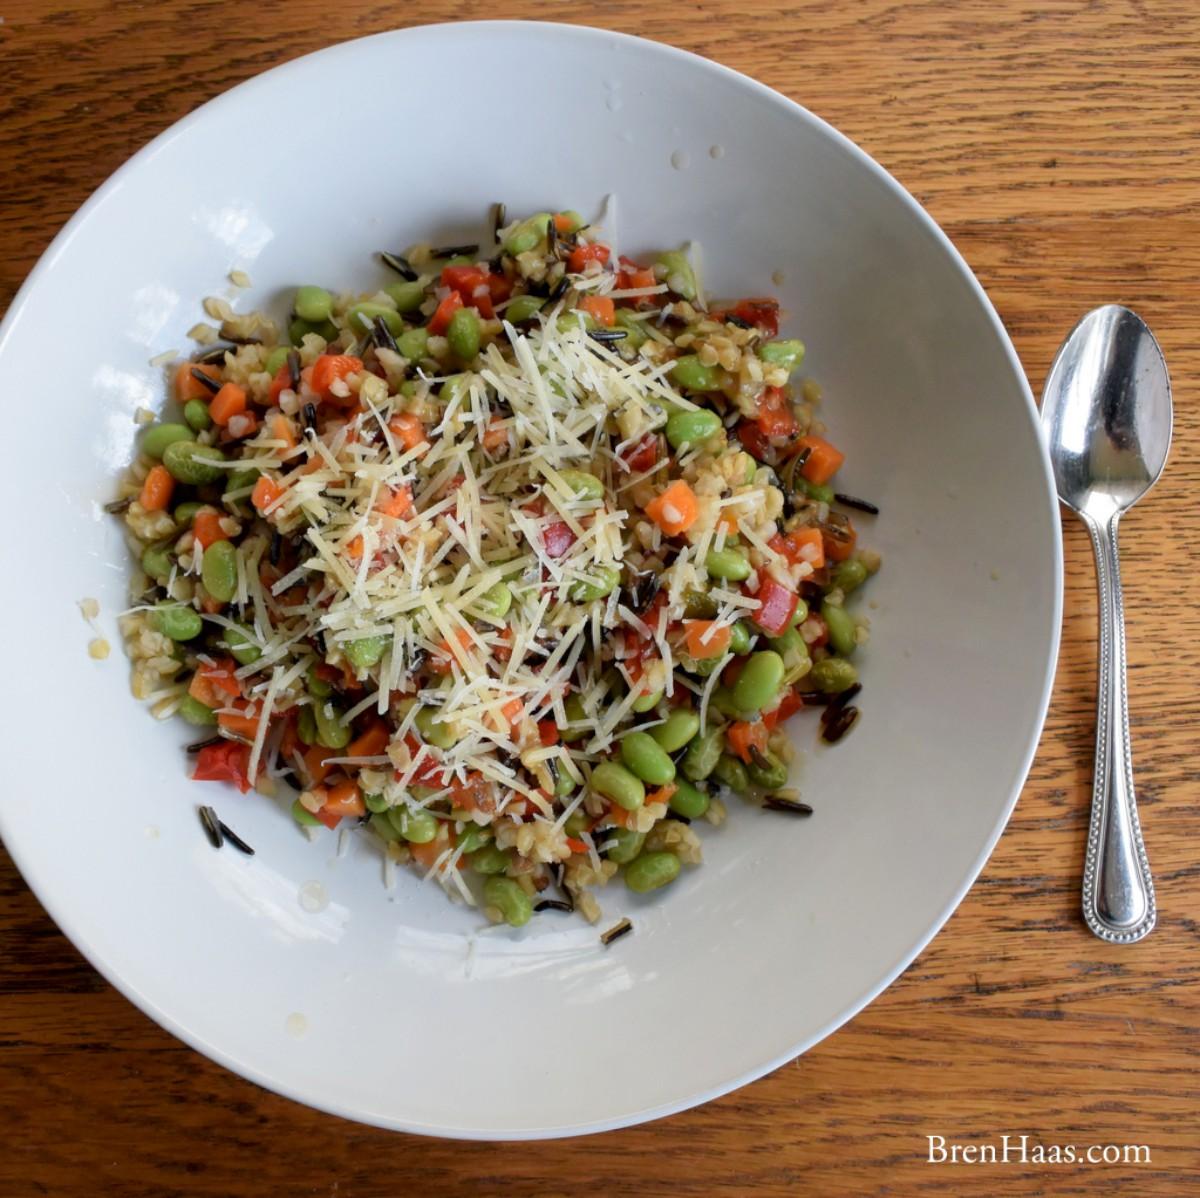 Sweet Ancient Grain and Edamame Salad